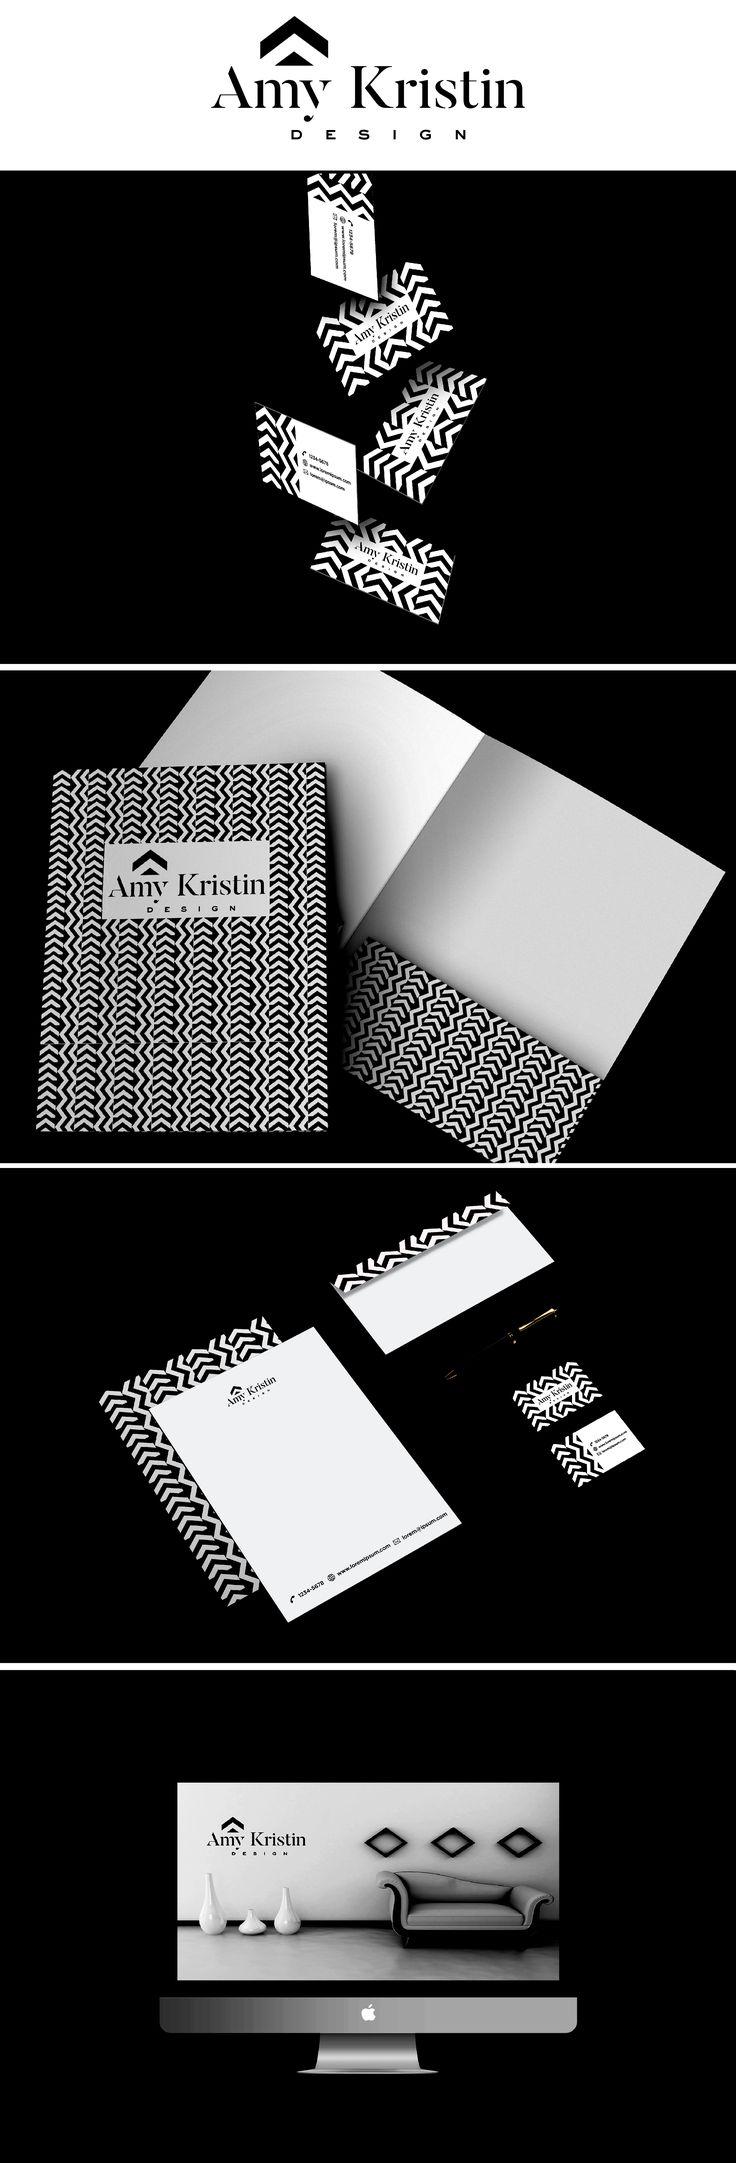 Amy Kristin Design Branding by Fivestar Branding